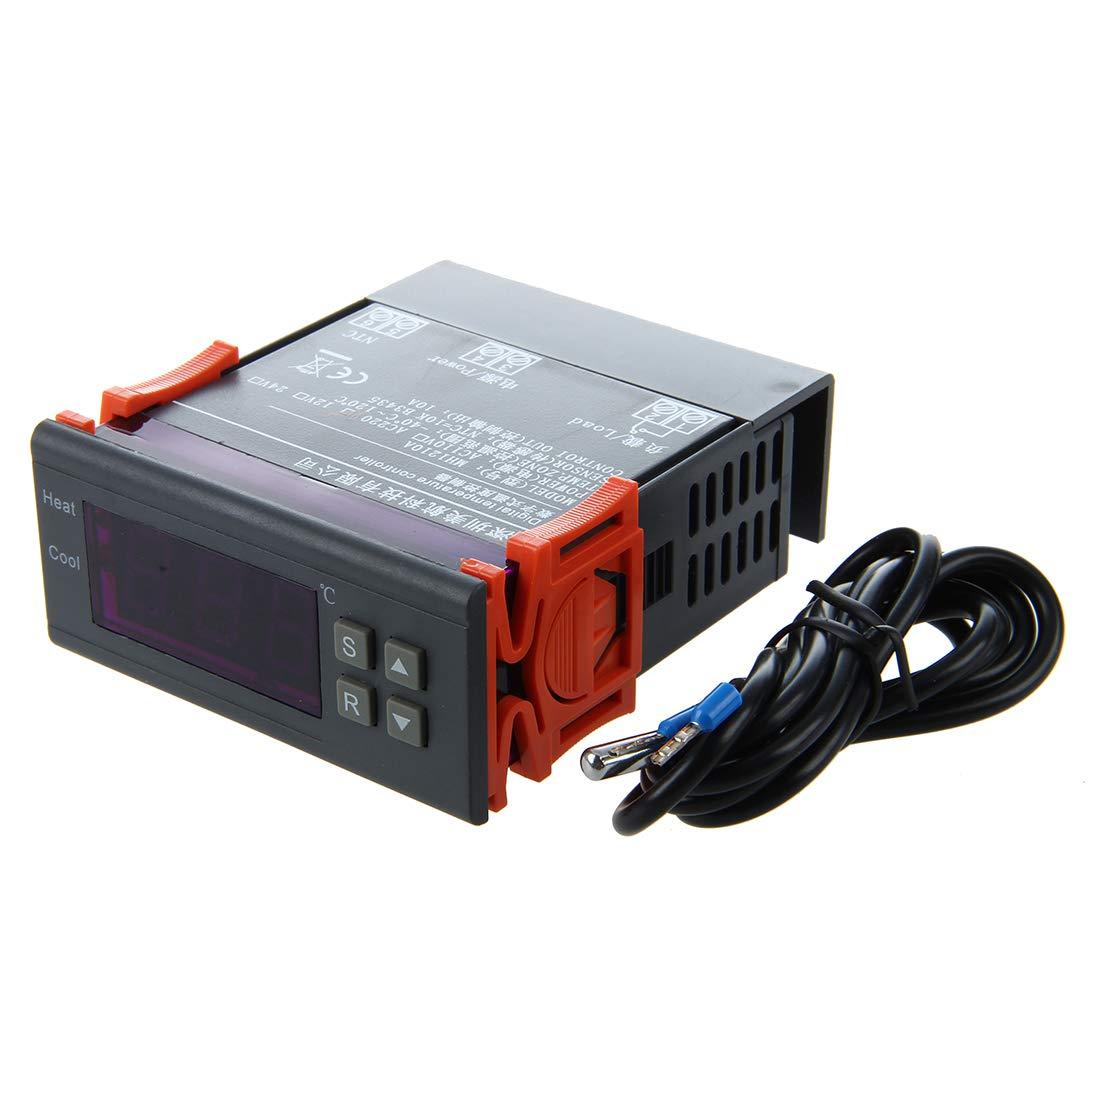 200-240V Temperatura controller termocoppia Digitale R TOOGOO 40 C a 120 C con sensore